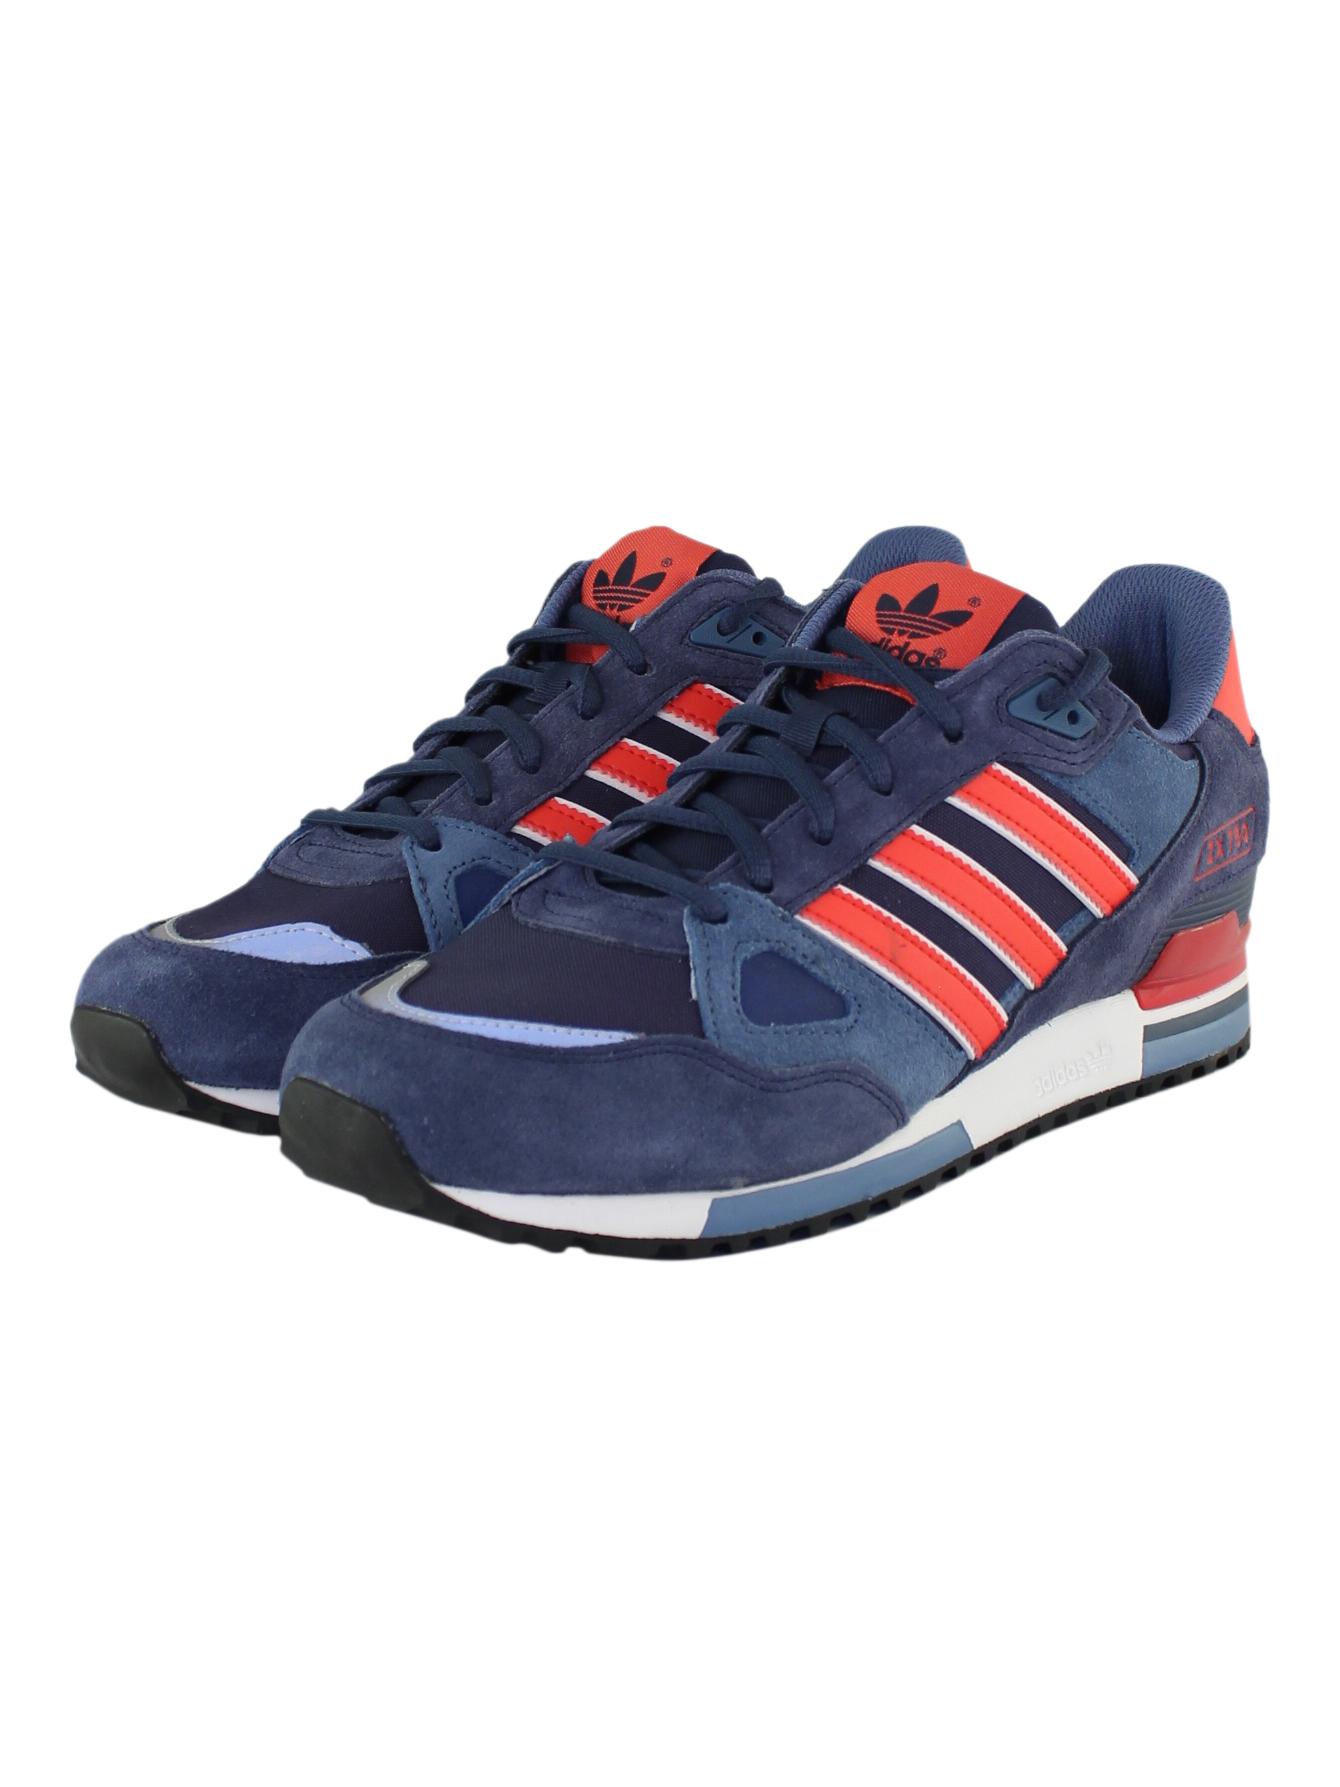 adidas zx 750 blau navy weiß rot